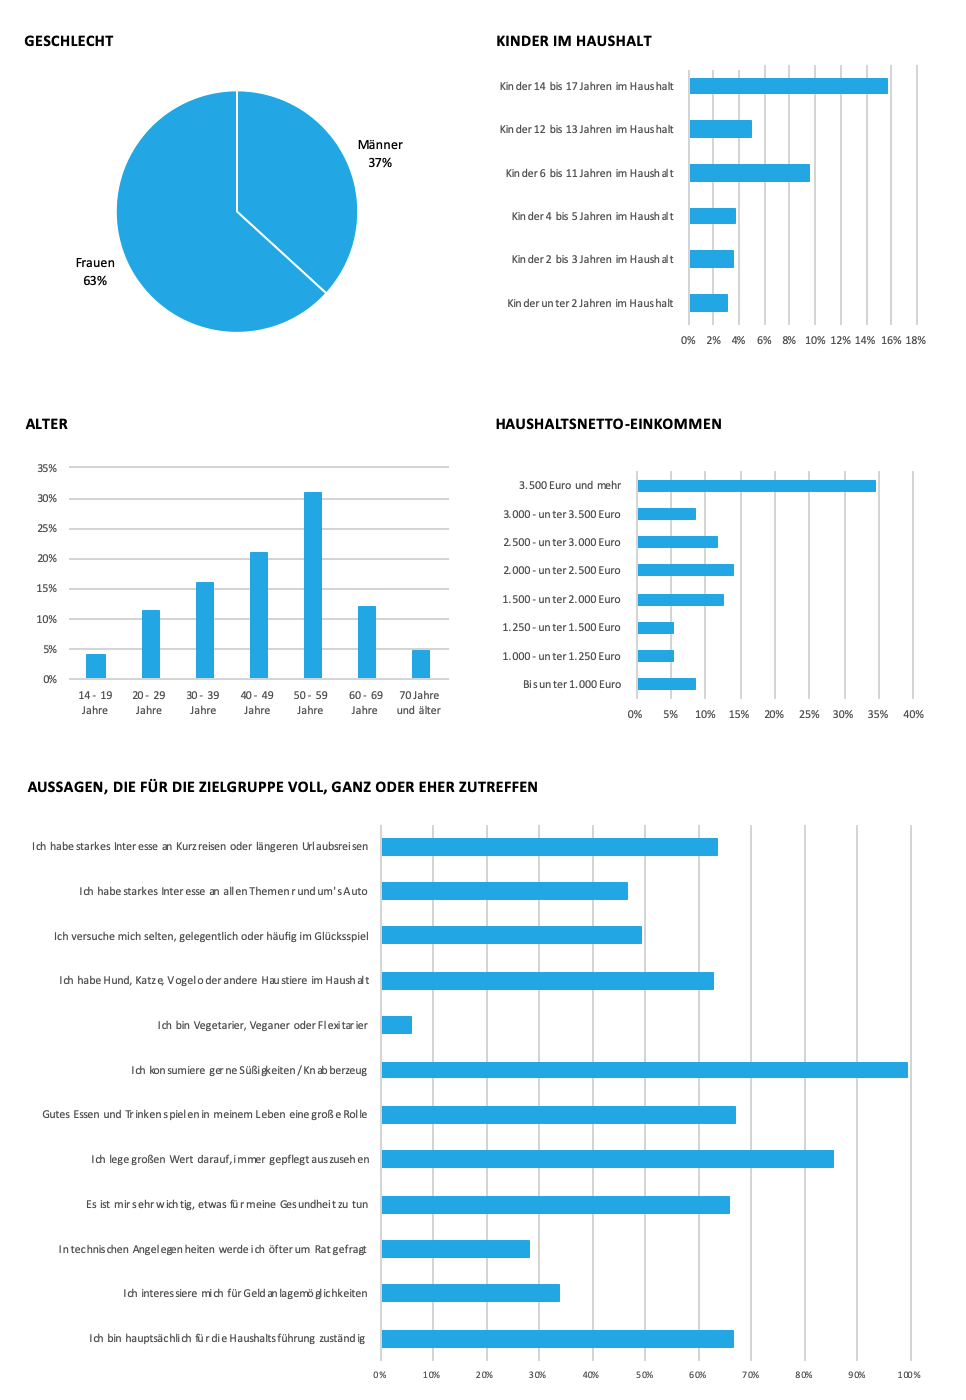 Grafik zu soziodemografischen Daten FRESSNAPF